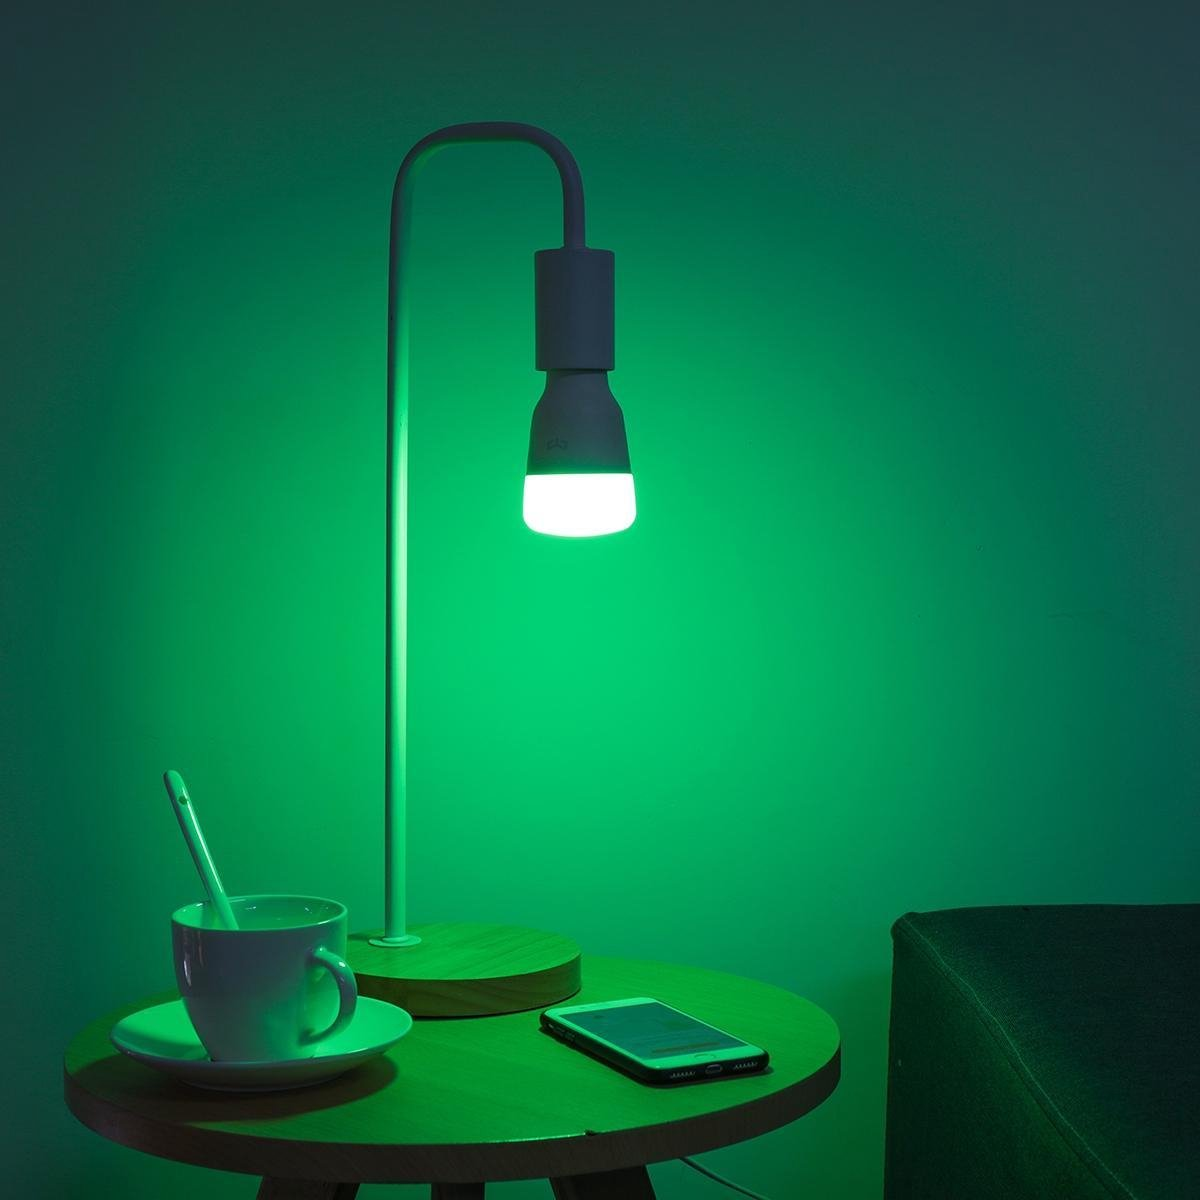 2 STKS Yeelight YLDP06YL E27 10 W RGBW Smart LED Lamp Werk Met Amazon Alexa AC100-240V (Xiaomi Ecosysteem Product)